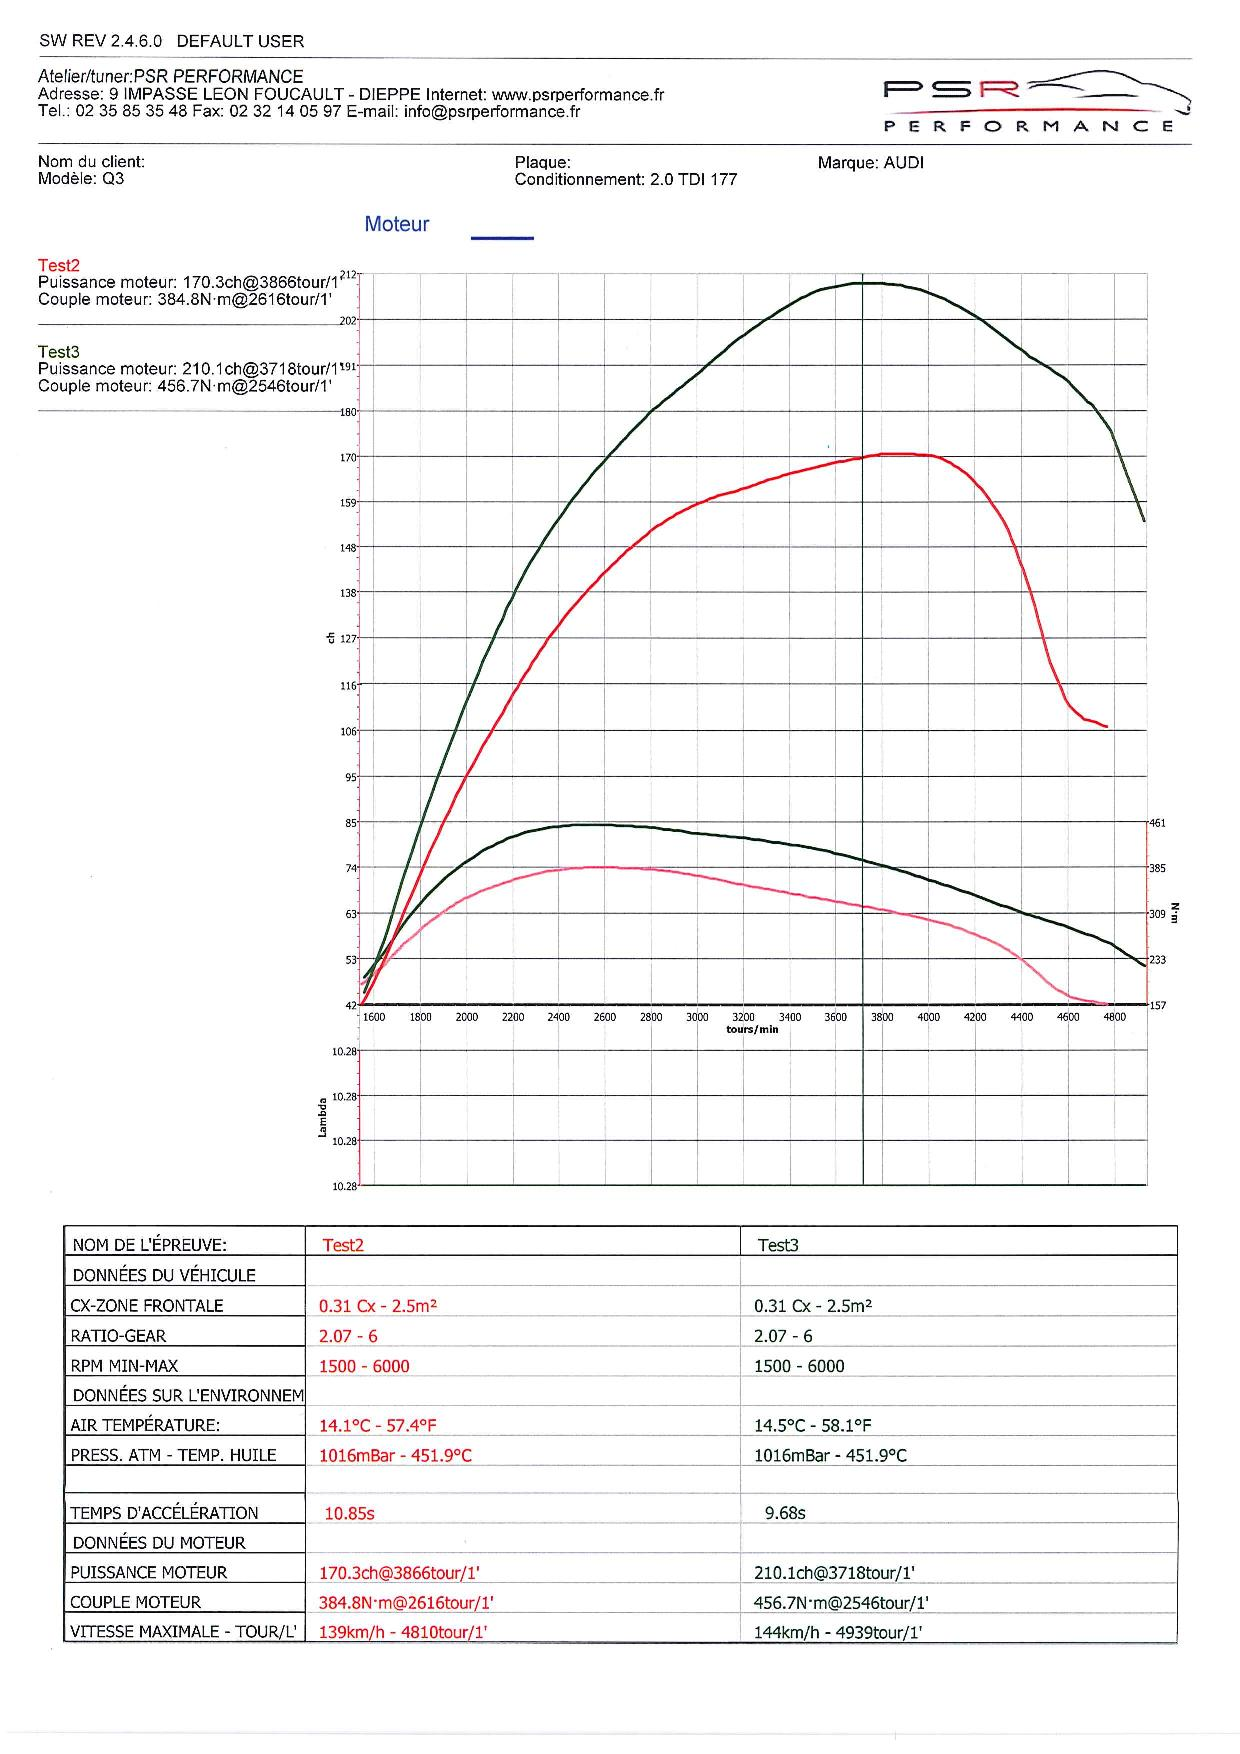 AUDI Q3 2.0 TDI 177 HP TUNE